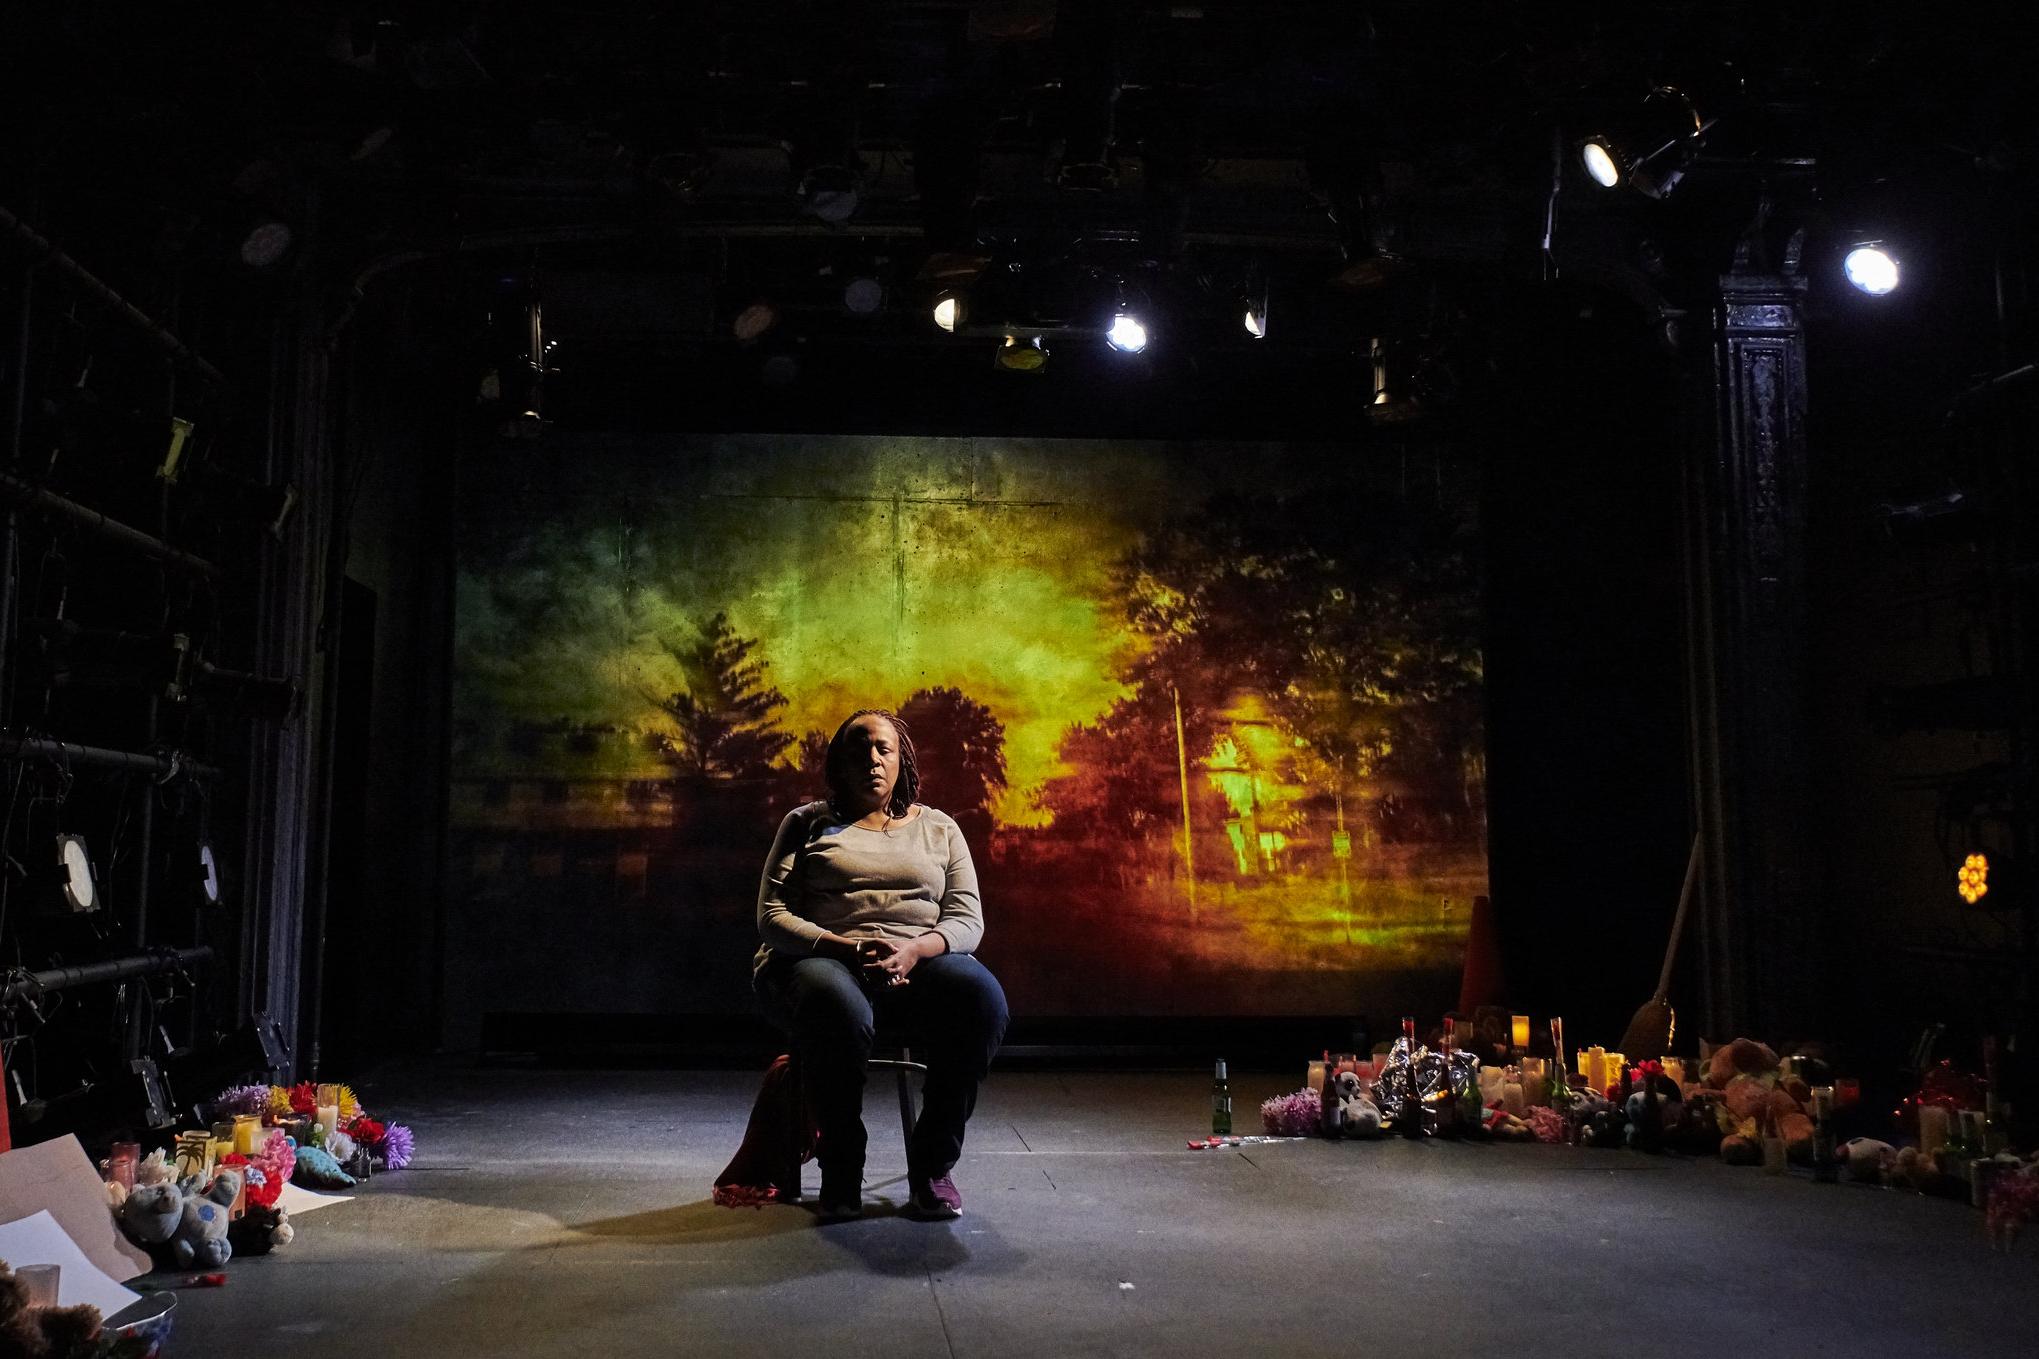 photo: Robert Altman, courtesy of Rattlestick Playwrights Theatre, 2018